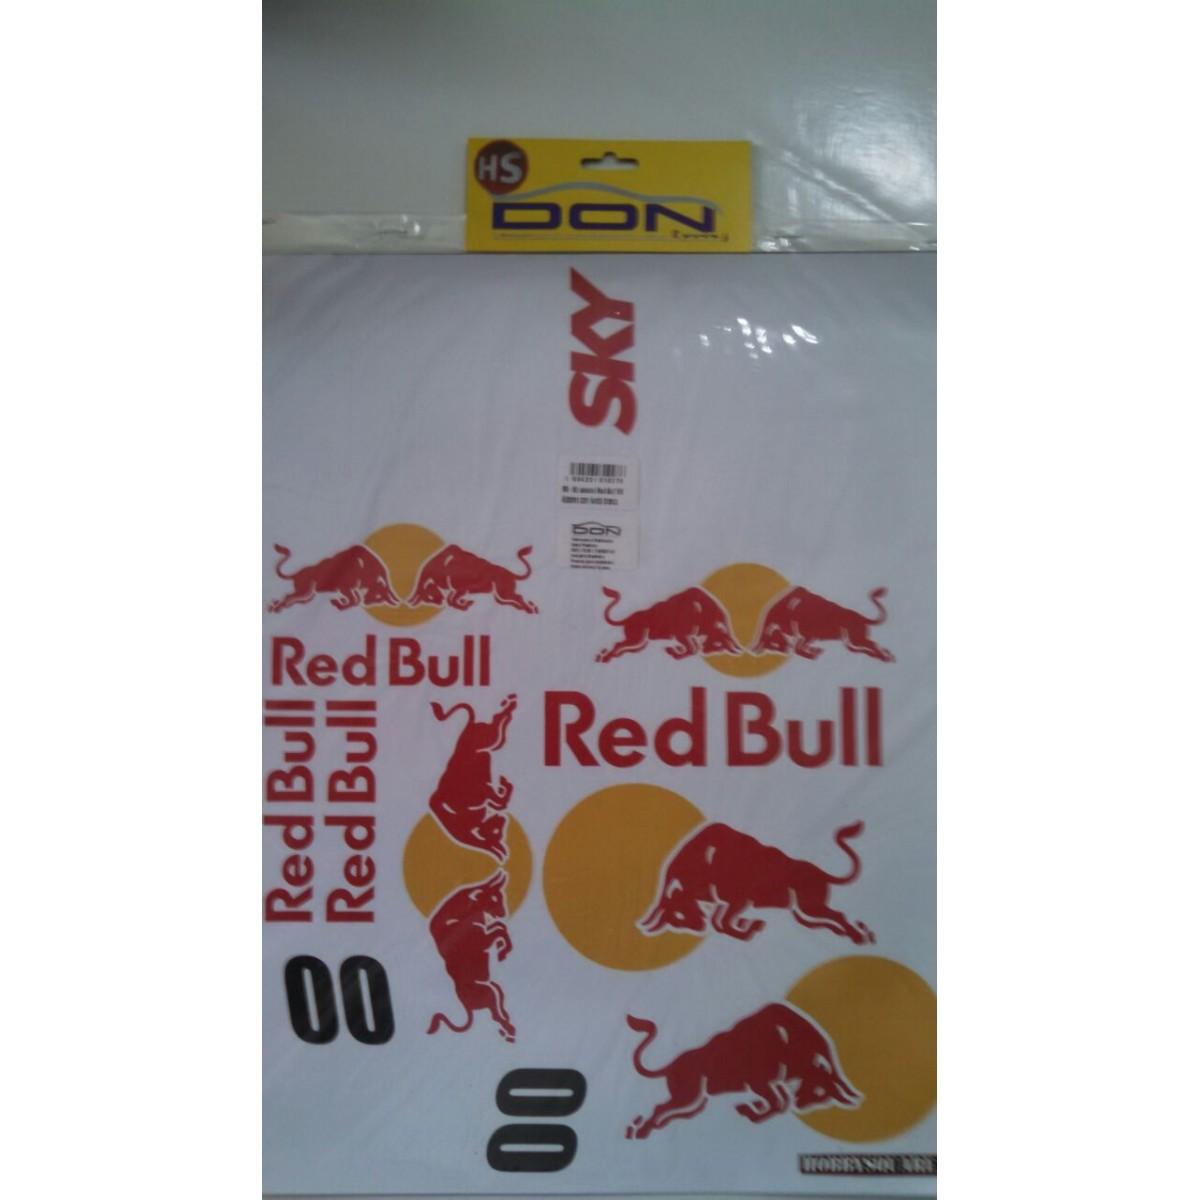 RB - Kit Adesivo Red Bull 1/8 - 150x200mm